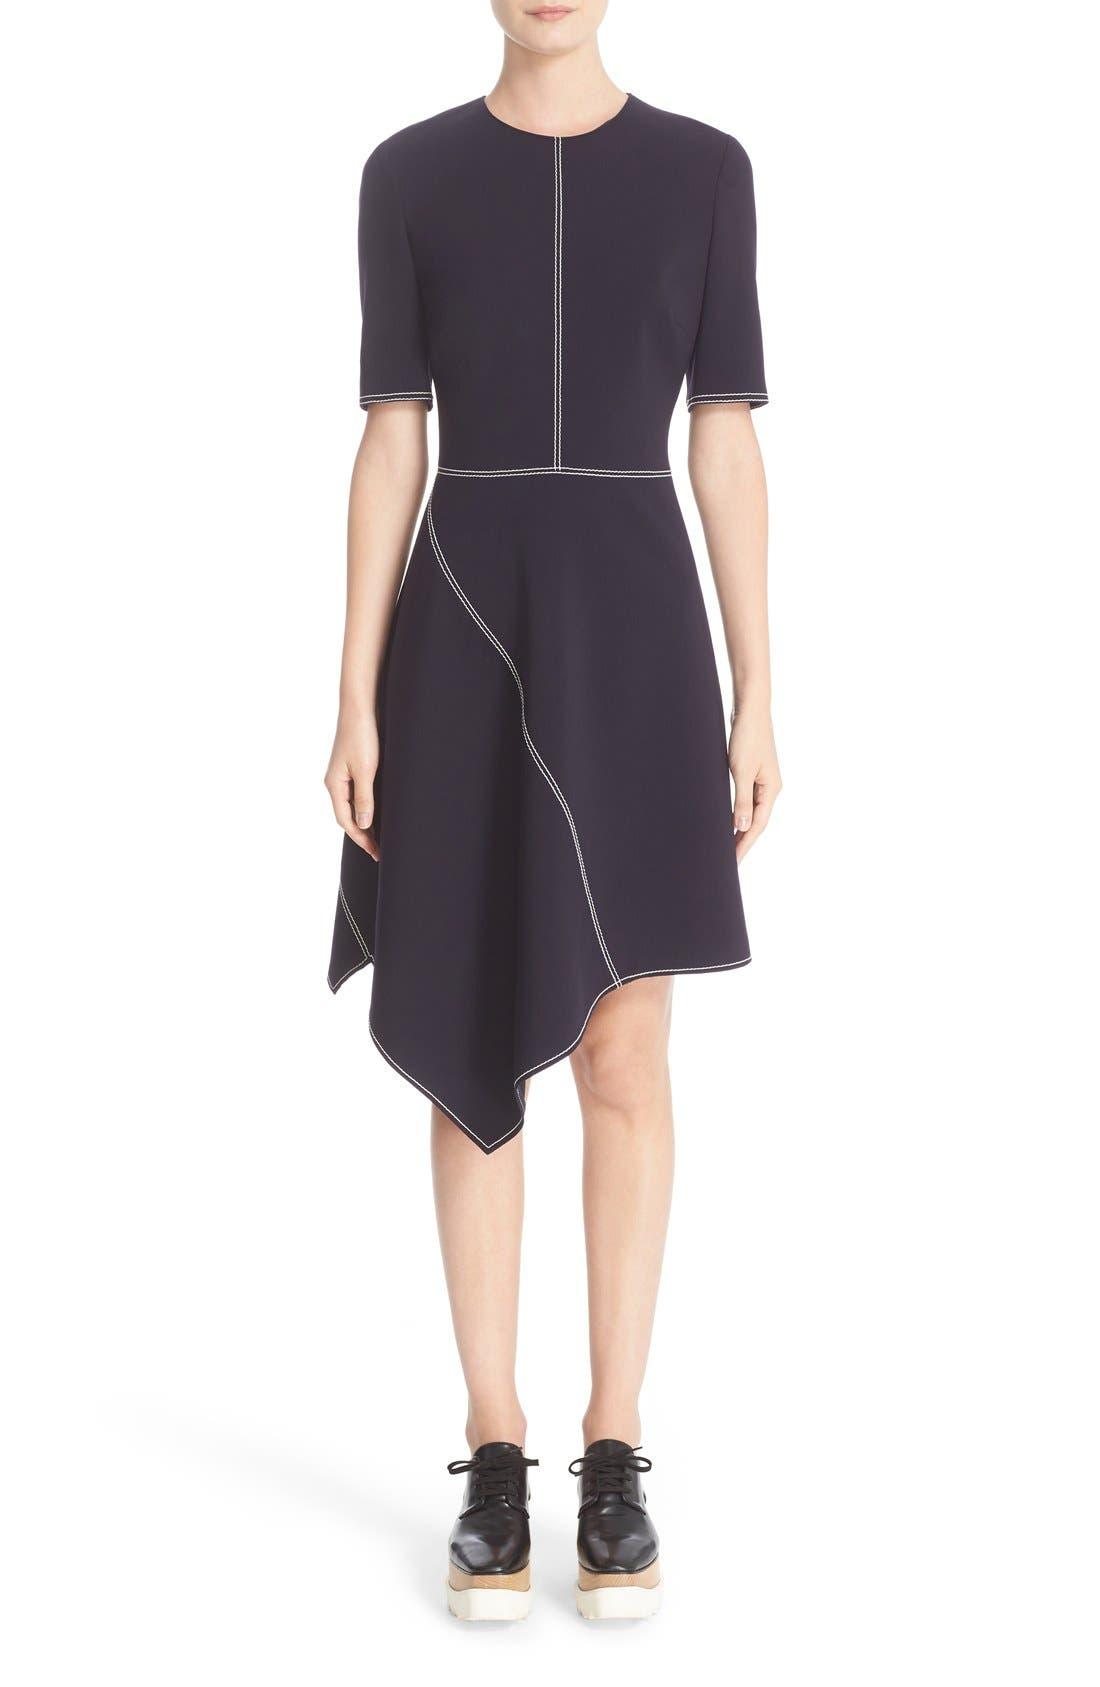 Alternate Image 1 Selected - Stella McCartney Topstitch Asymmetrical Dress